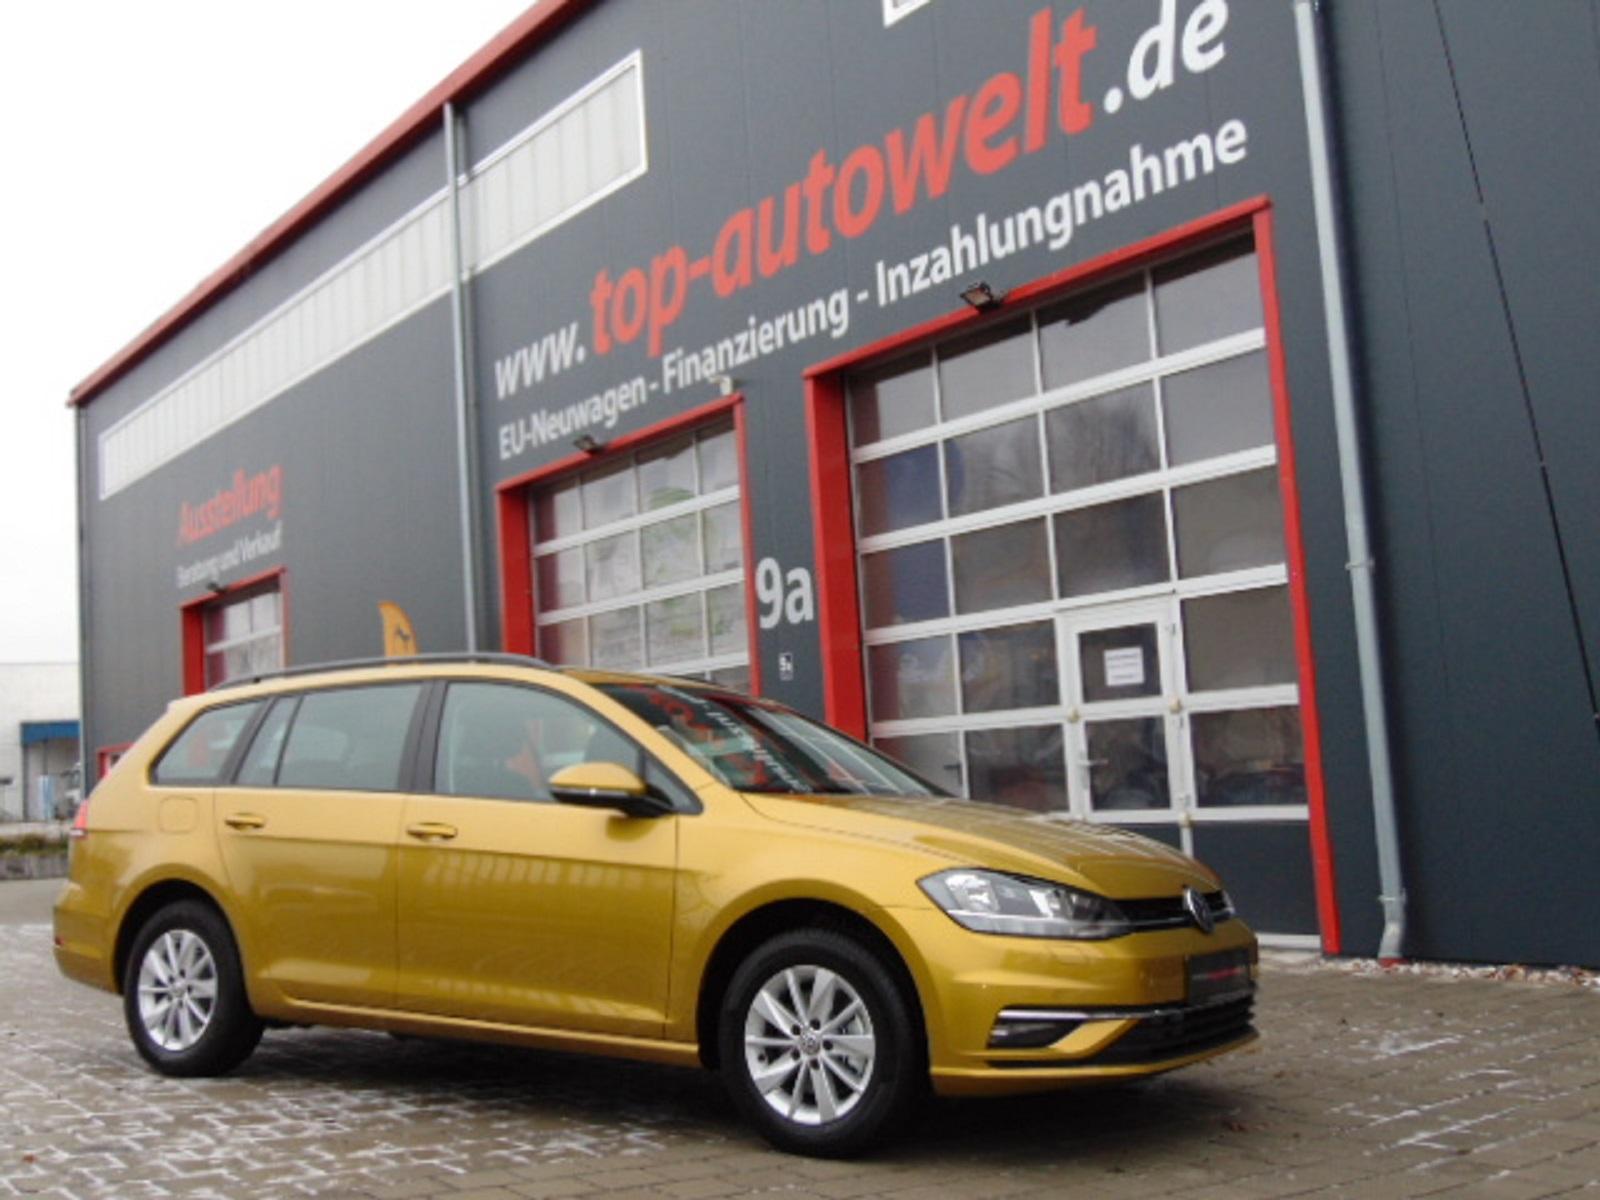 Volkswagen Golf Variant fortline 2 0 TDI 150 PS DSG Automatik